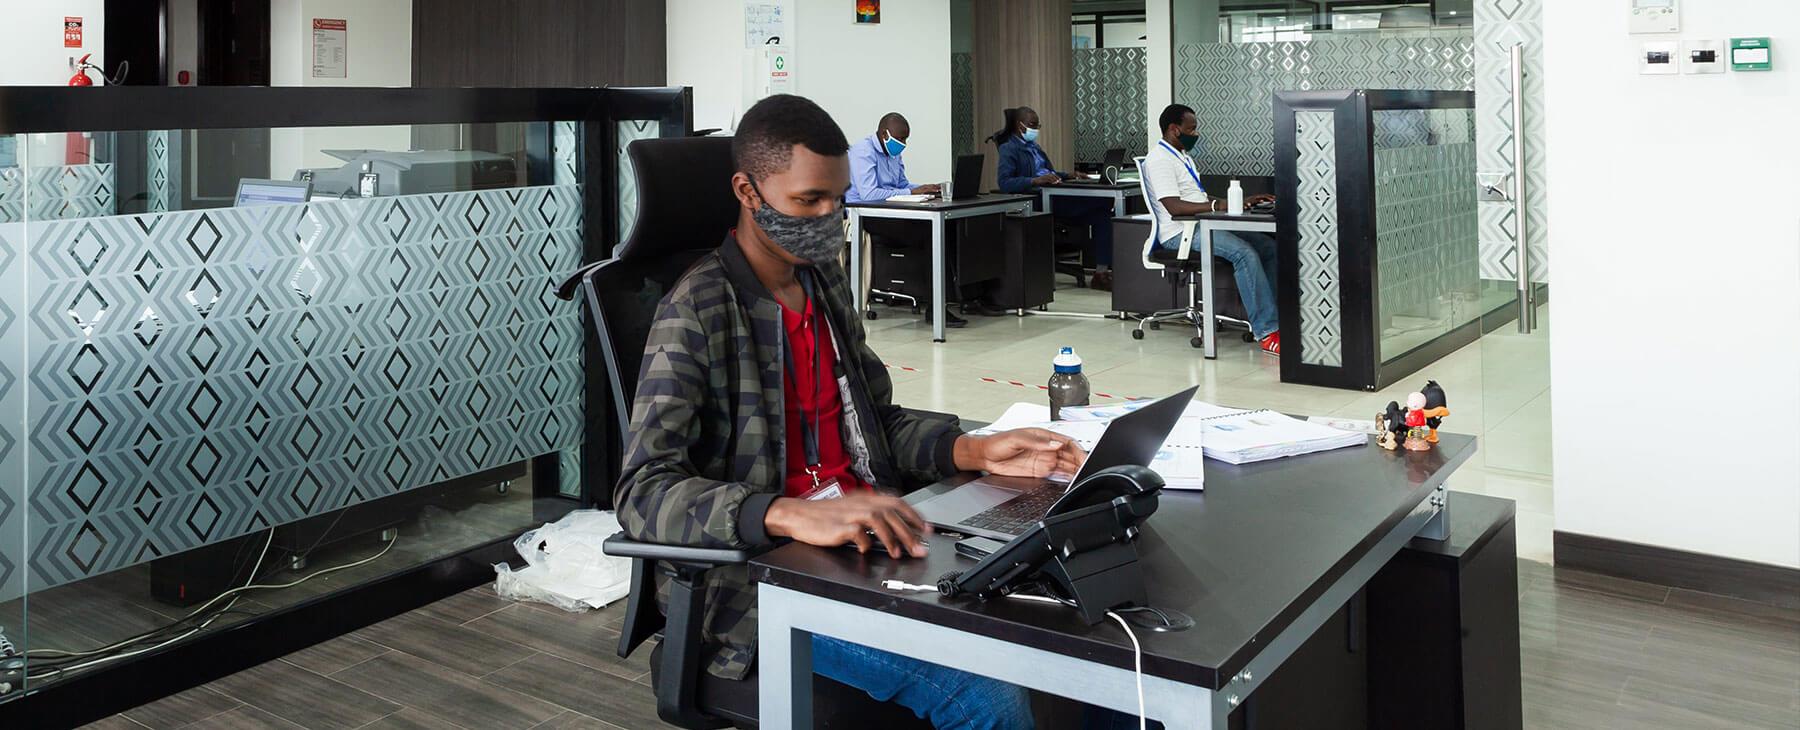 Sai Office - Careers